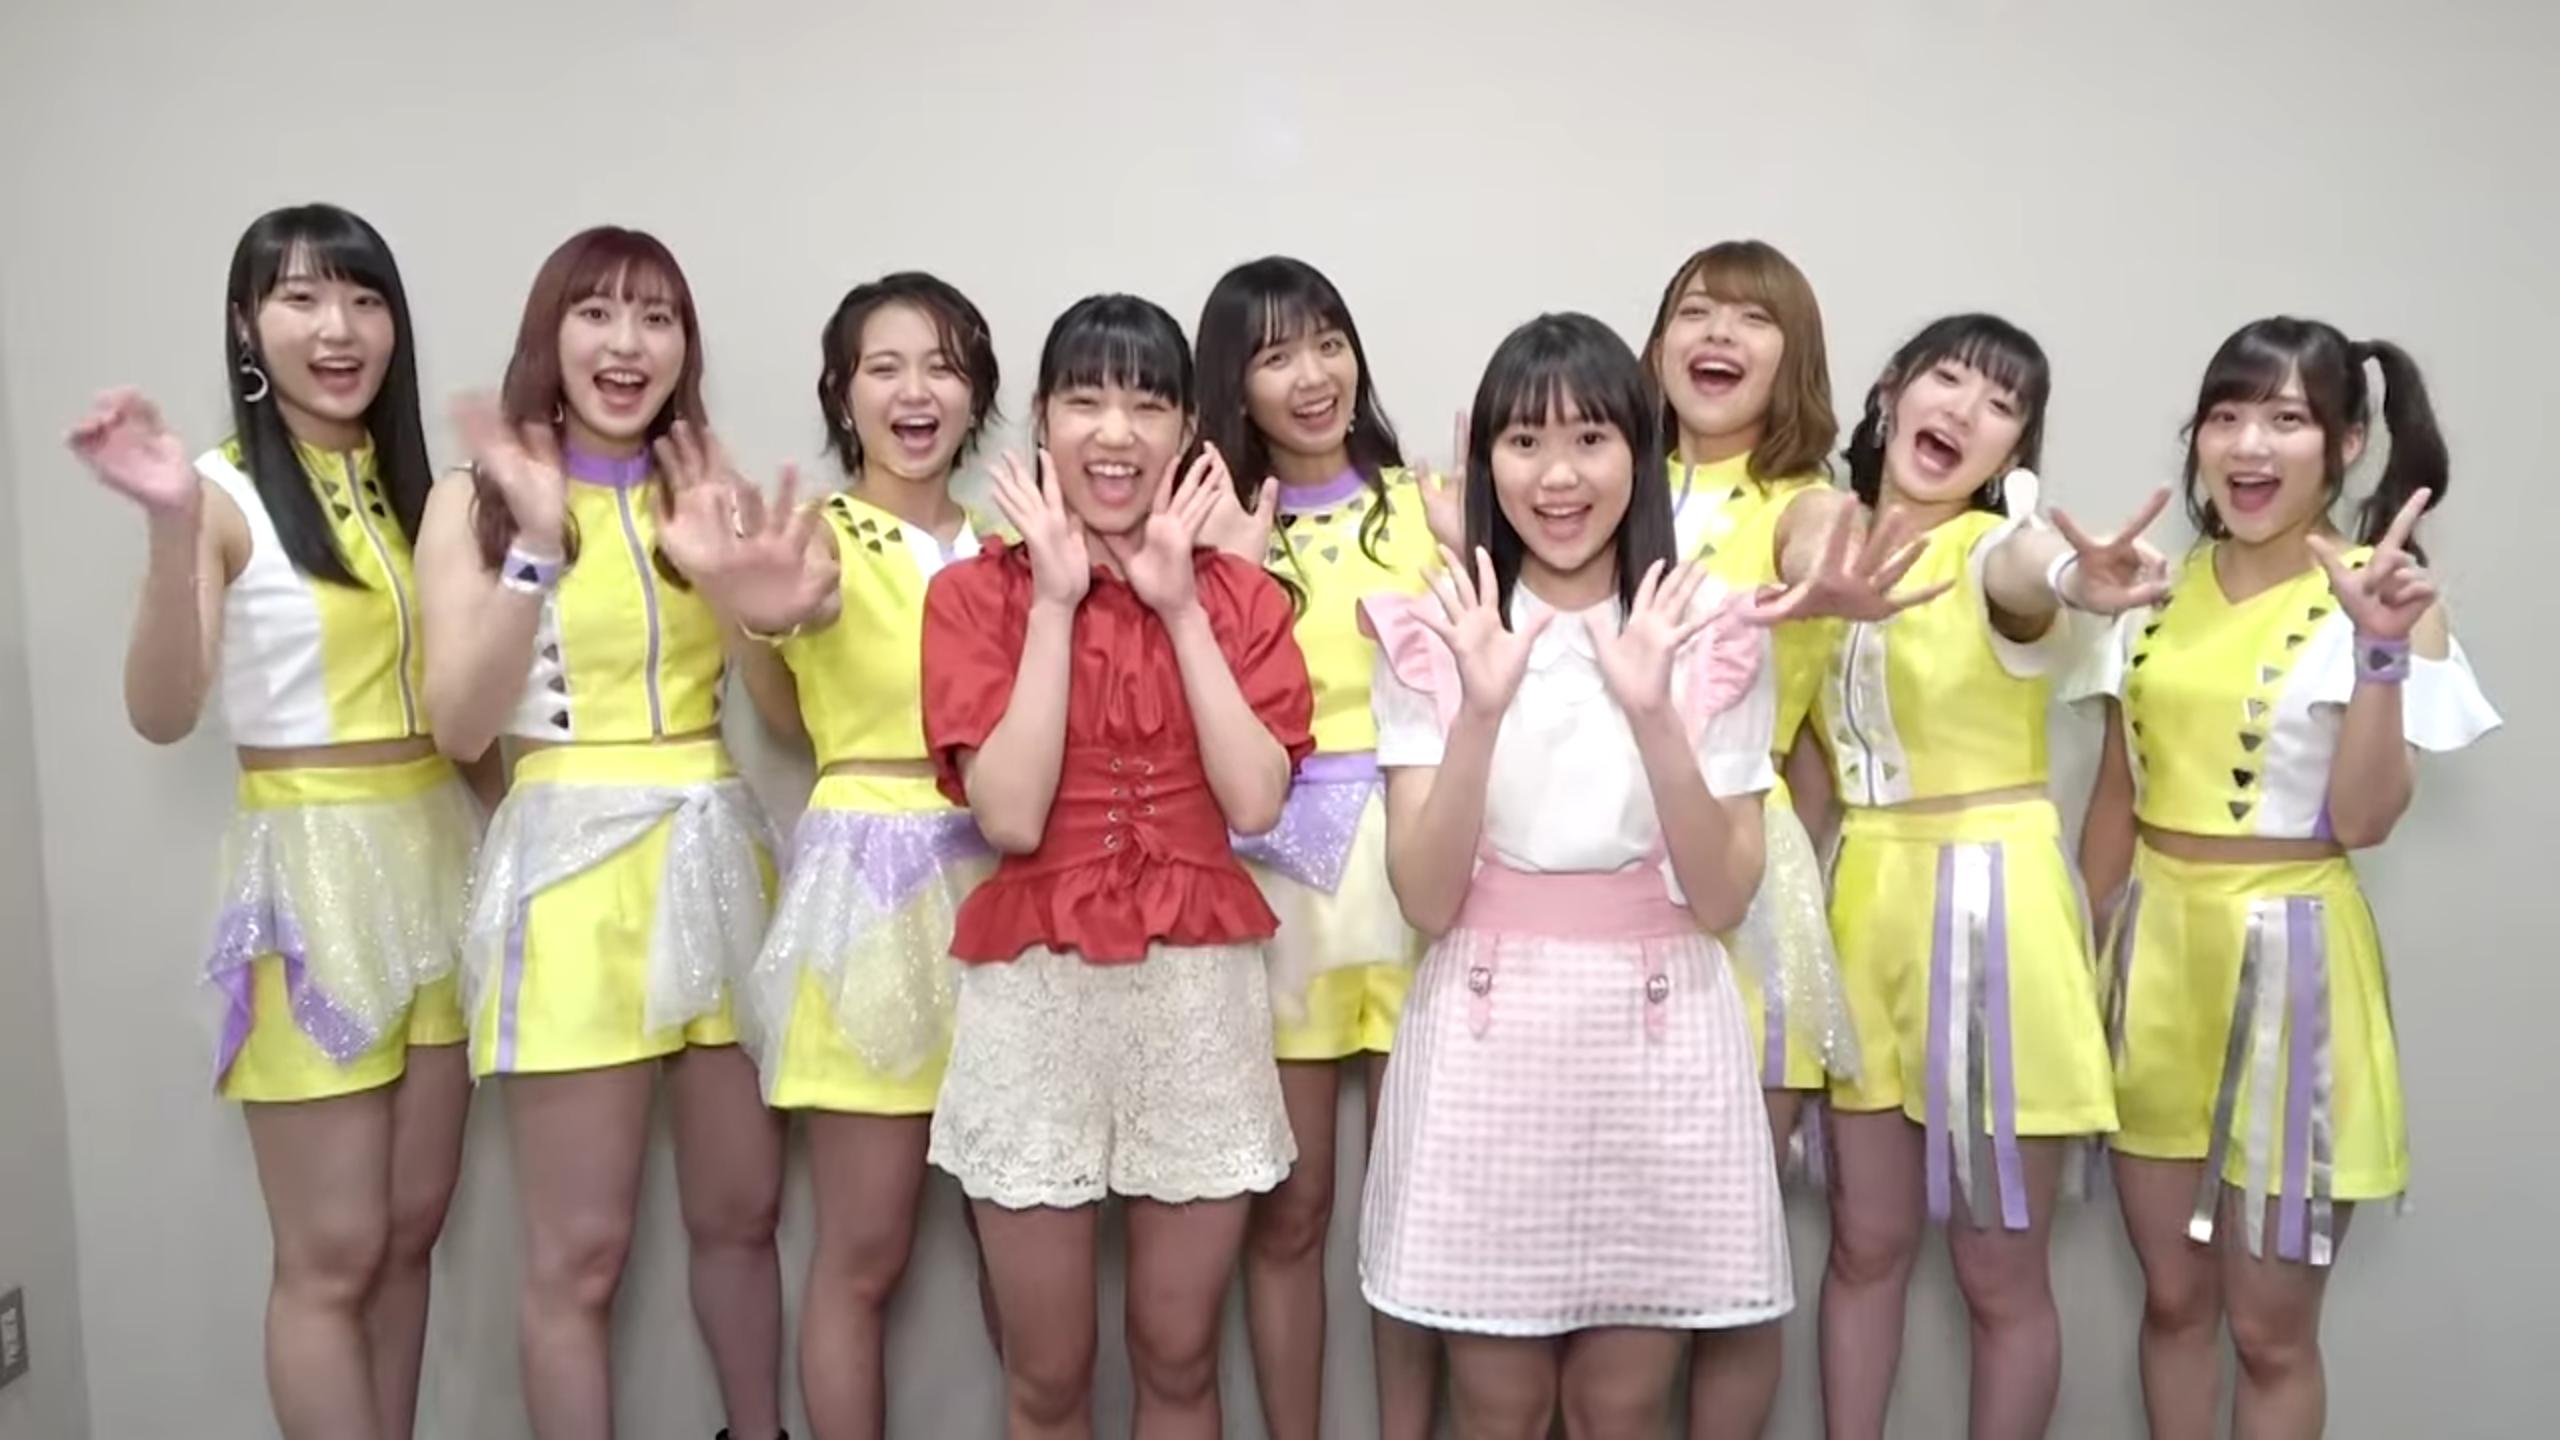 Seven girls/women in predominantly yellow costumes (Juice=Juice), Matsunaga Riai, and Kudo Yume all wave goodbye. Matsunaga and Kudo are standing in front of their new groupmates.